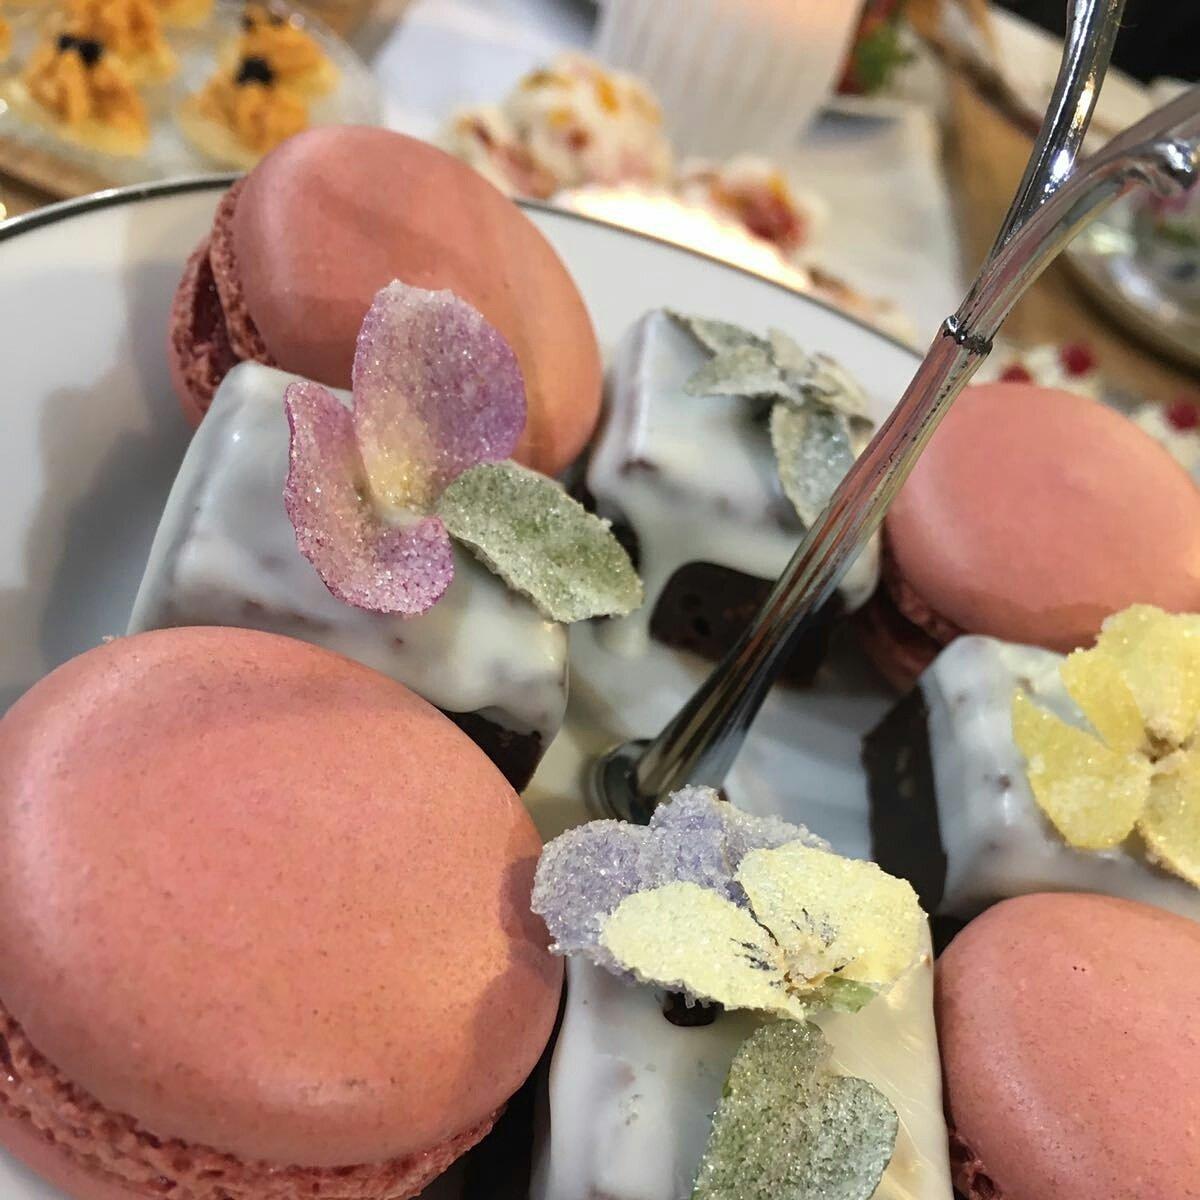 Pink. #blog #blogger #fashion #fashionblogger #StreetStyle #rosa #Pink #nuncaesdemasiadorosa #vacaciones #holiday #Verano #summer #Vacances <br>http://pic.twitter.com/maZPVxKByU